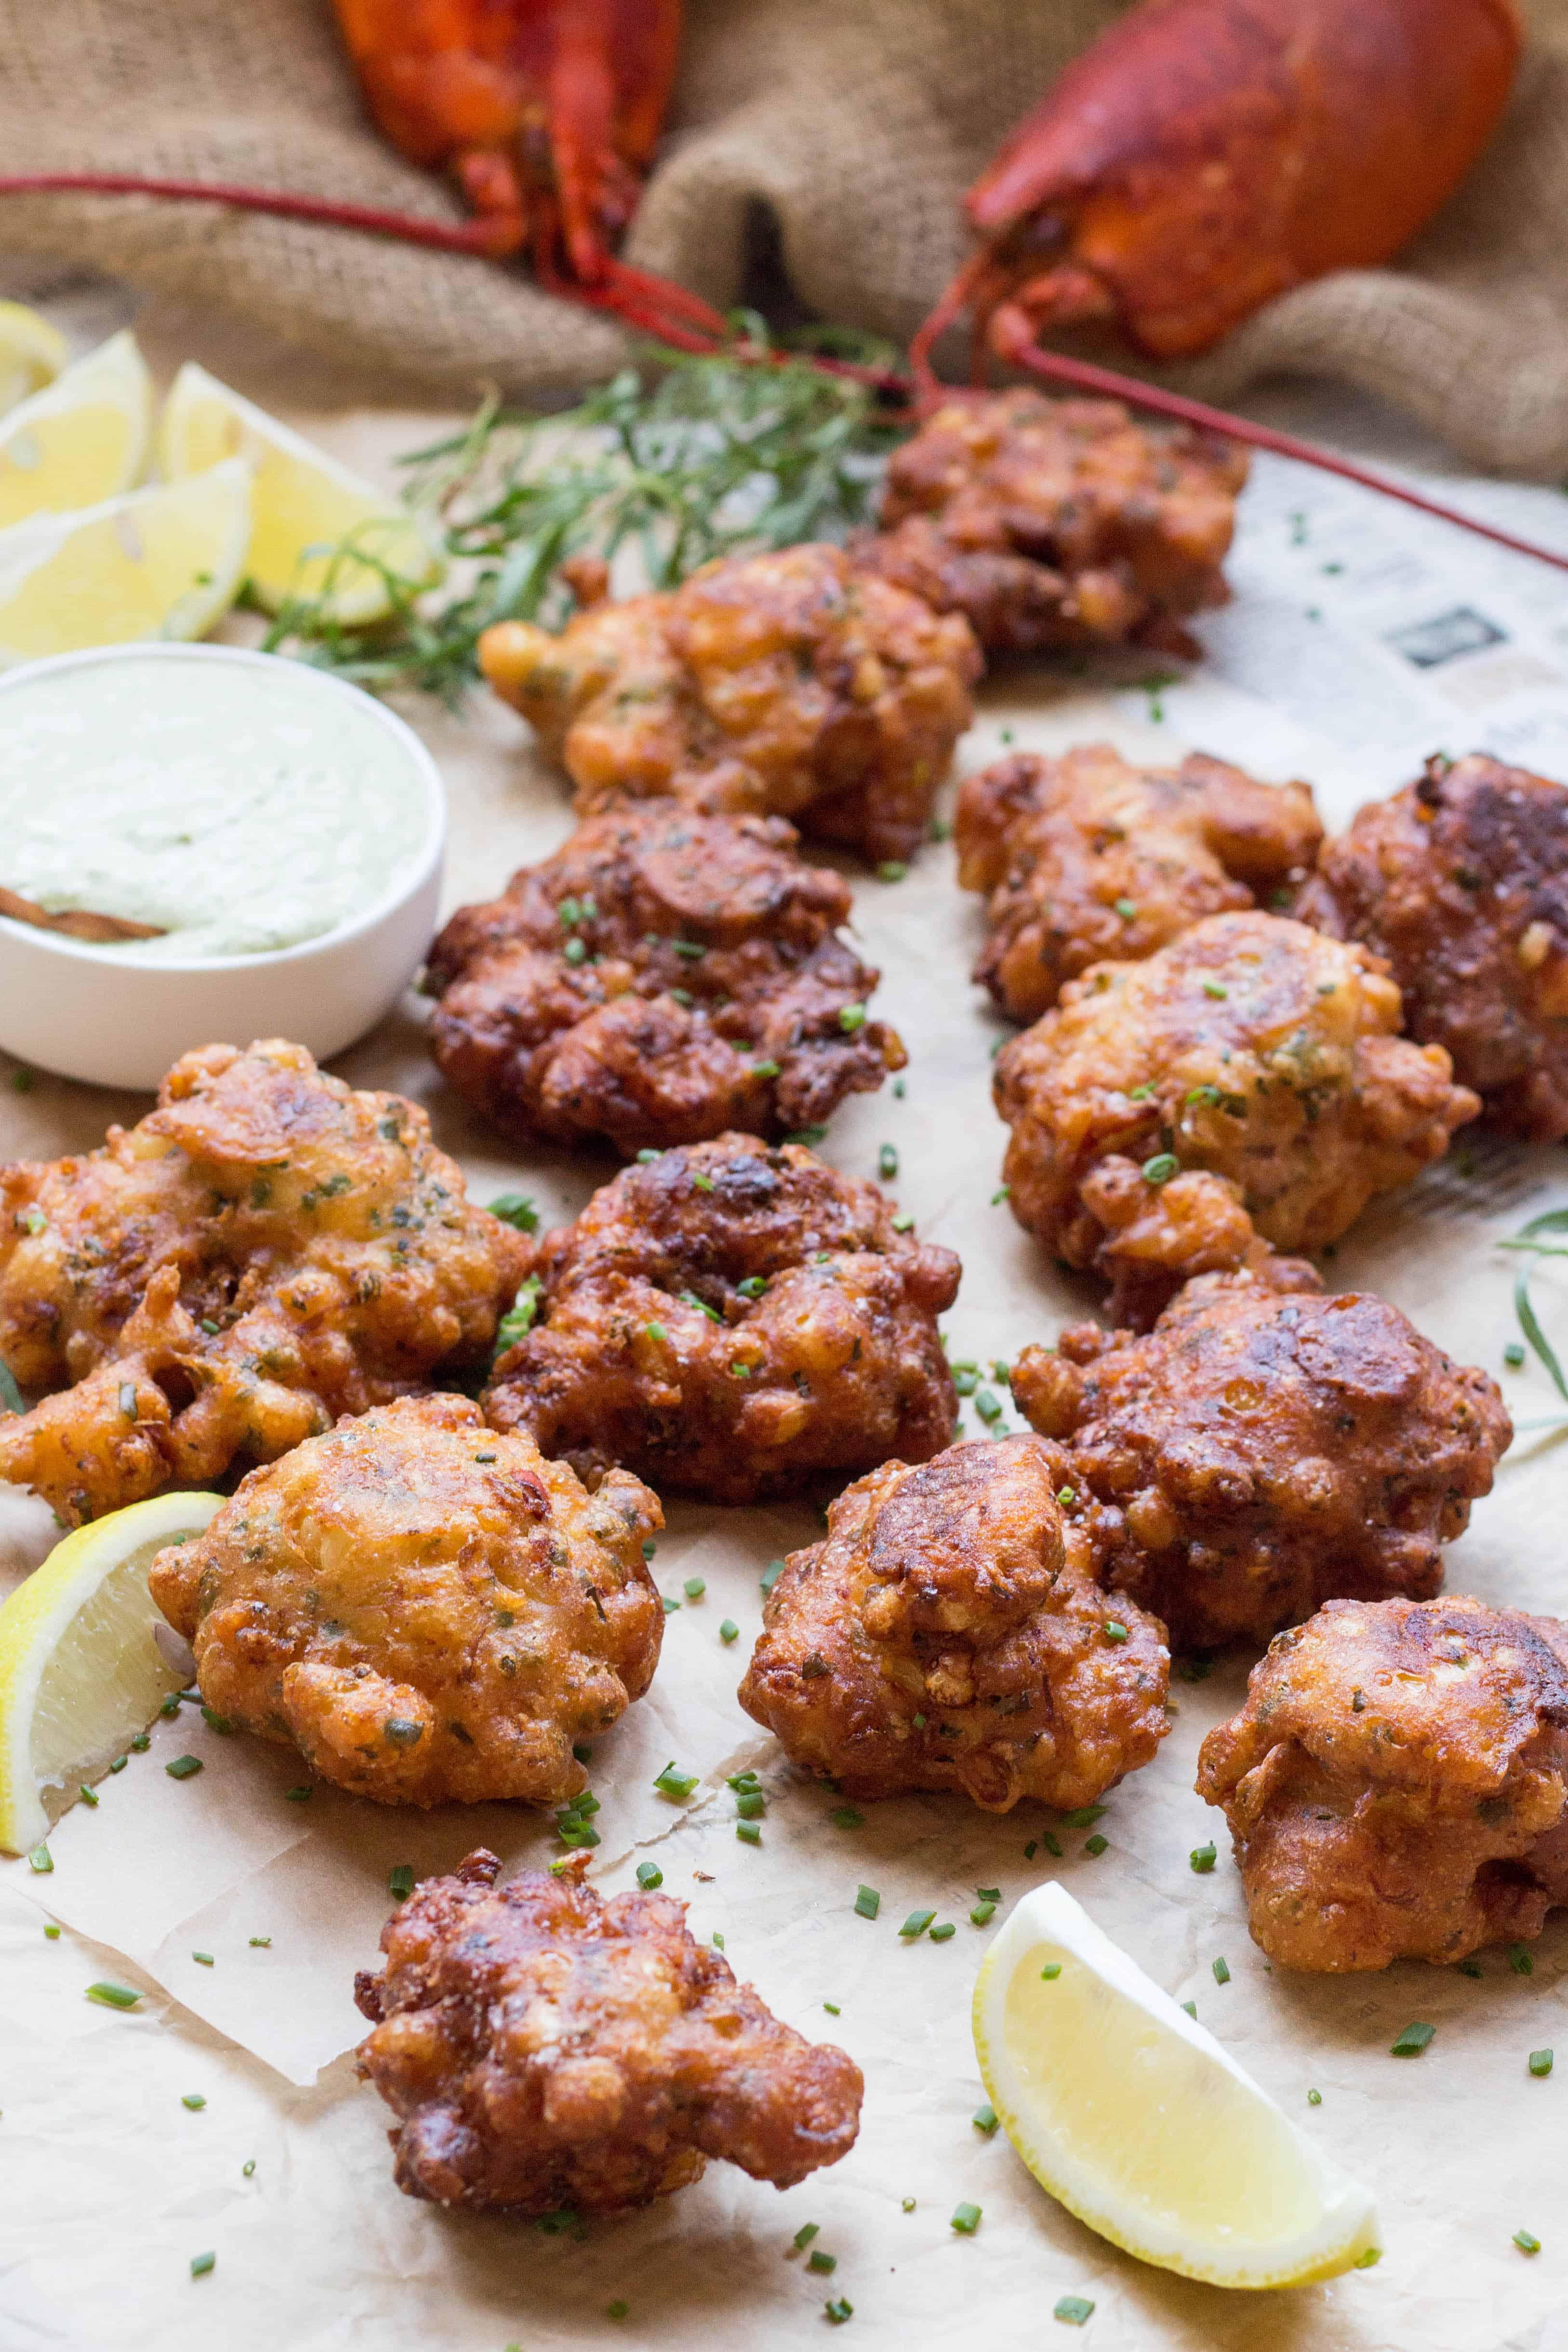 Lobster Corn Fritters with Tarragon Aioli